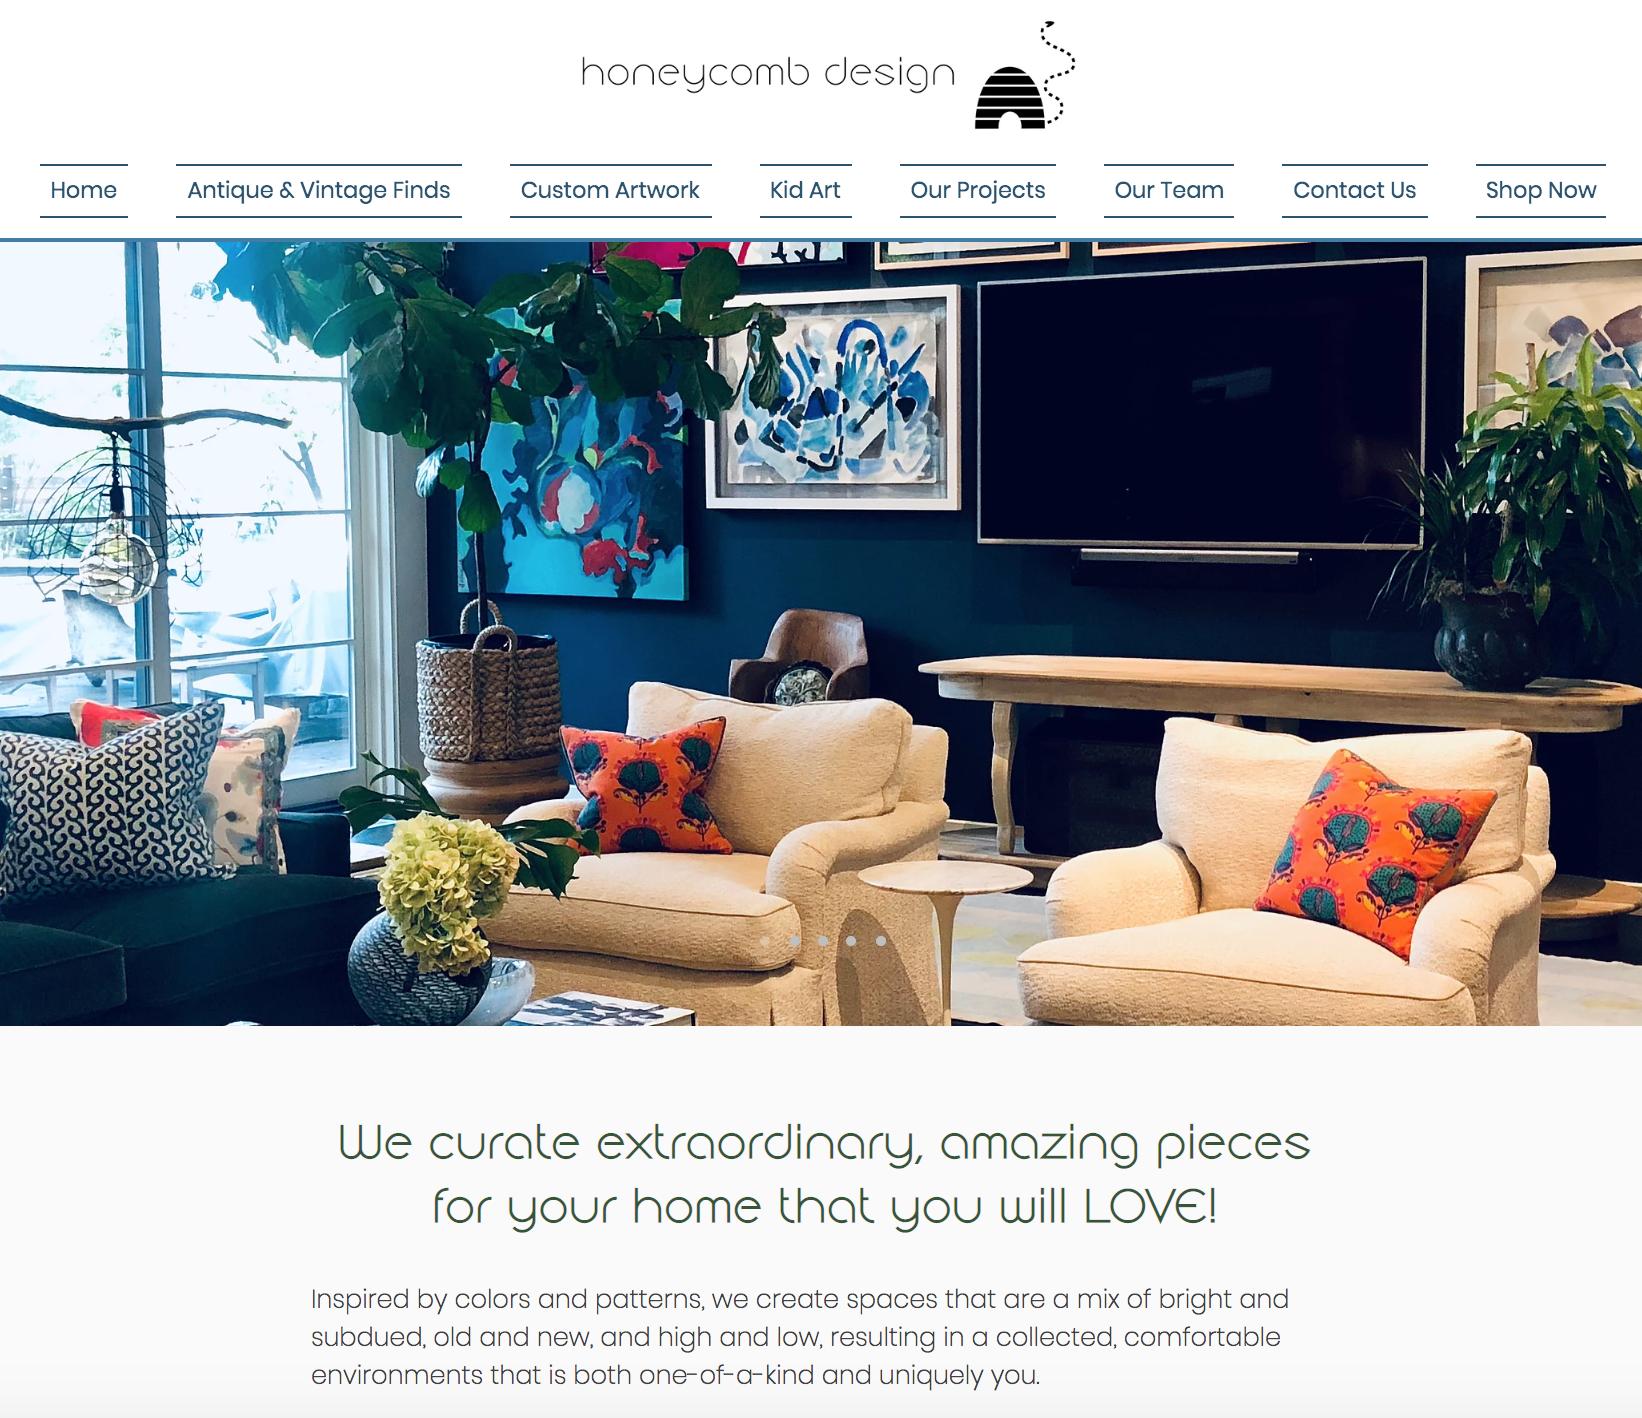 thehoneycombdesign.com